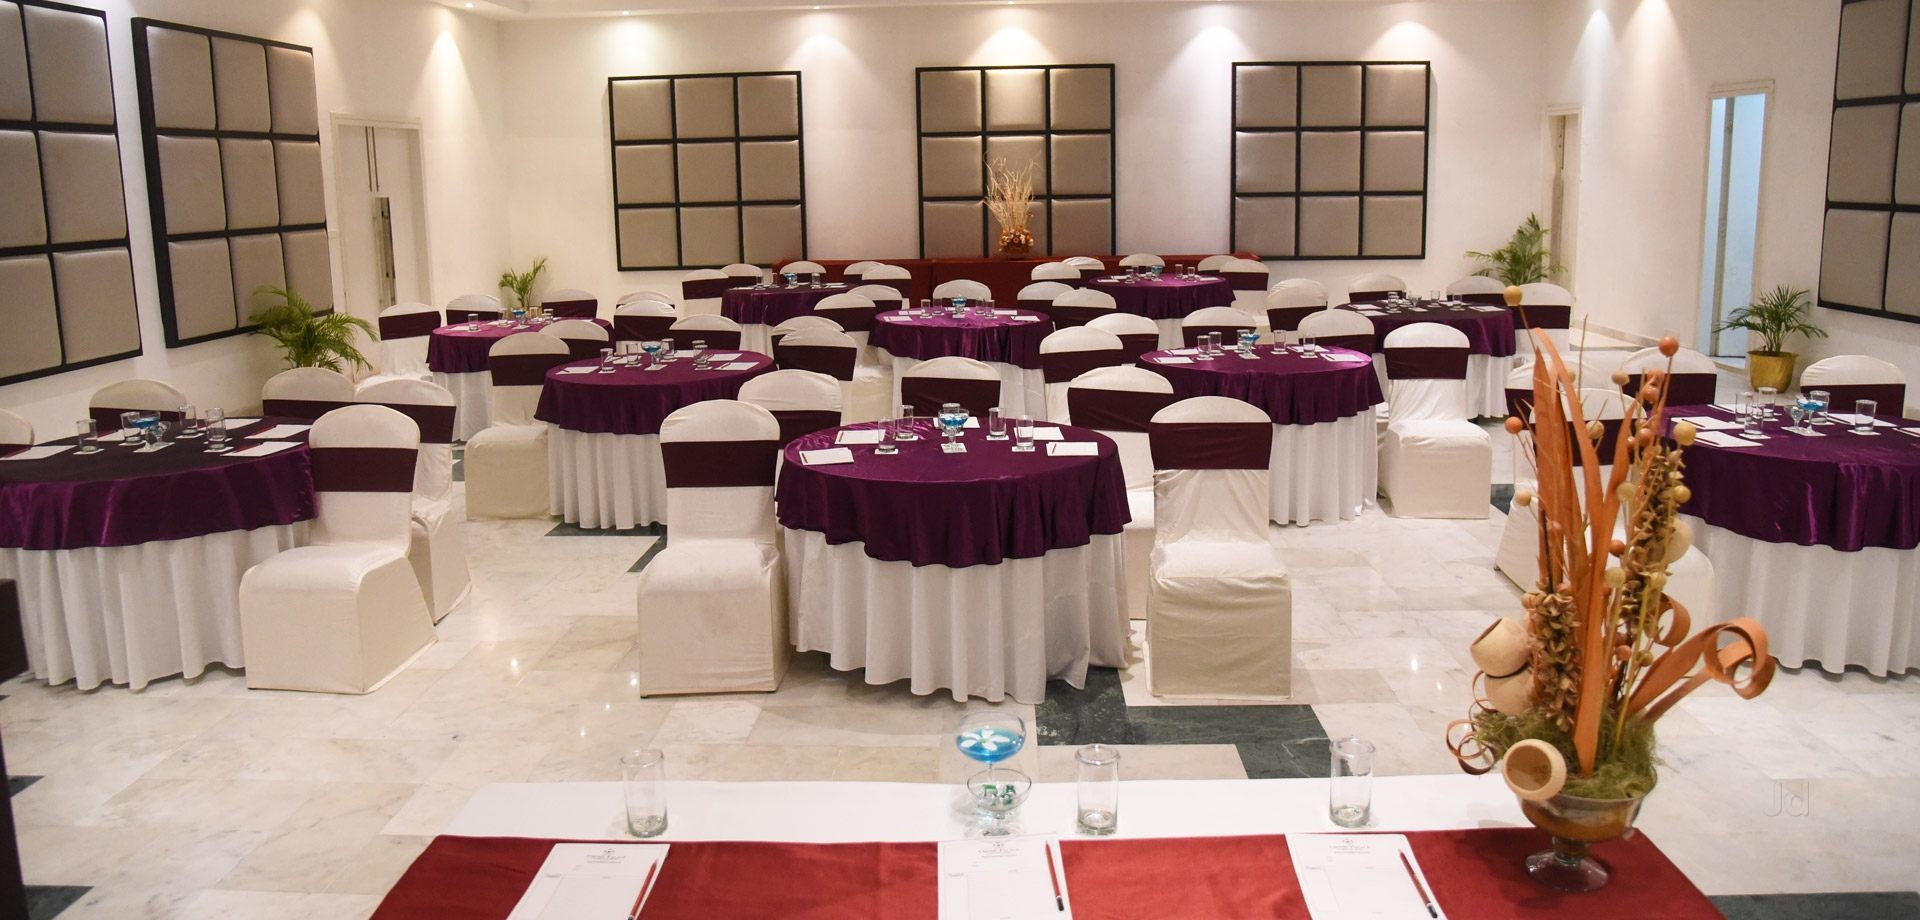 Best Wedding Planner, Decorator, Chomu Palace, Jaipur, India Best Wedding Planner and decorator at Chomu Palace, Wedding planner in Rajasthan, wedding planner in Jaipur, wedding planner in palace Chomu Palace, corporate events in Chomu Palace, sound in Chomu Palace, wedding in Chomu Palace, sound for corporate event in The Chomu Palace Jaipur